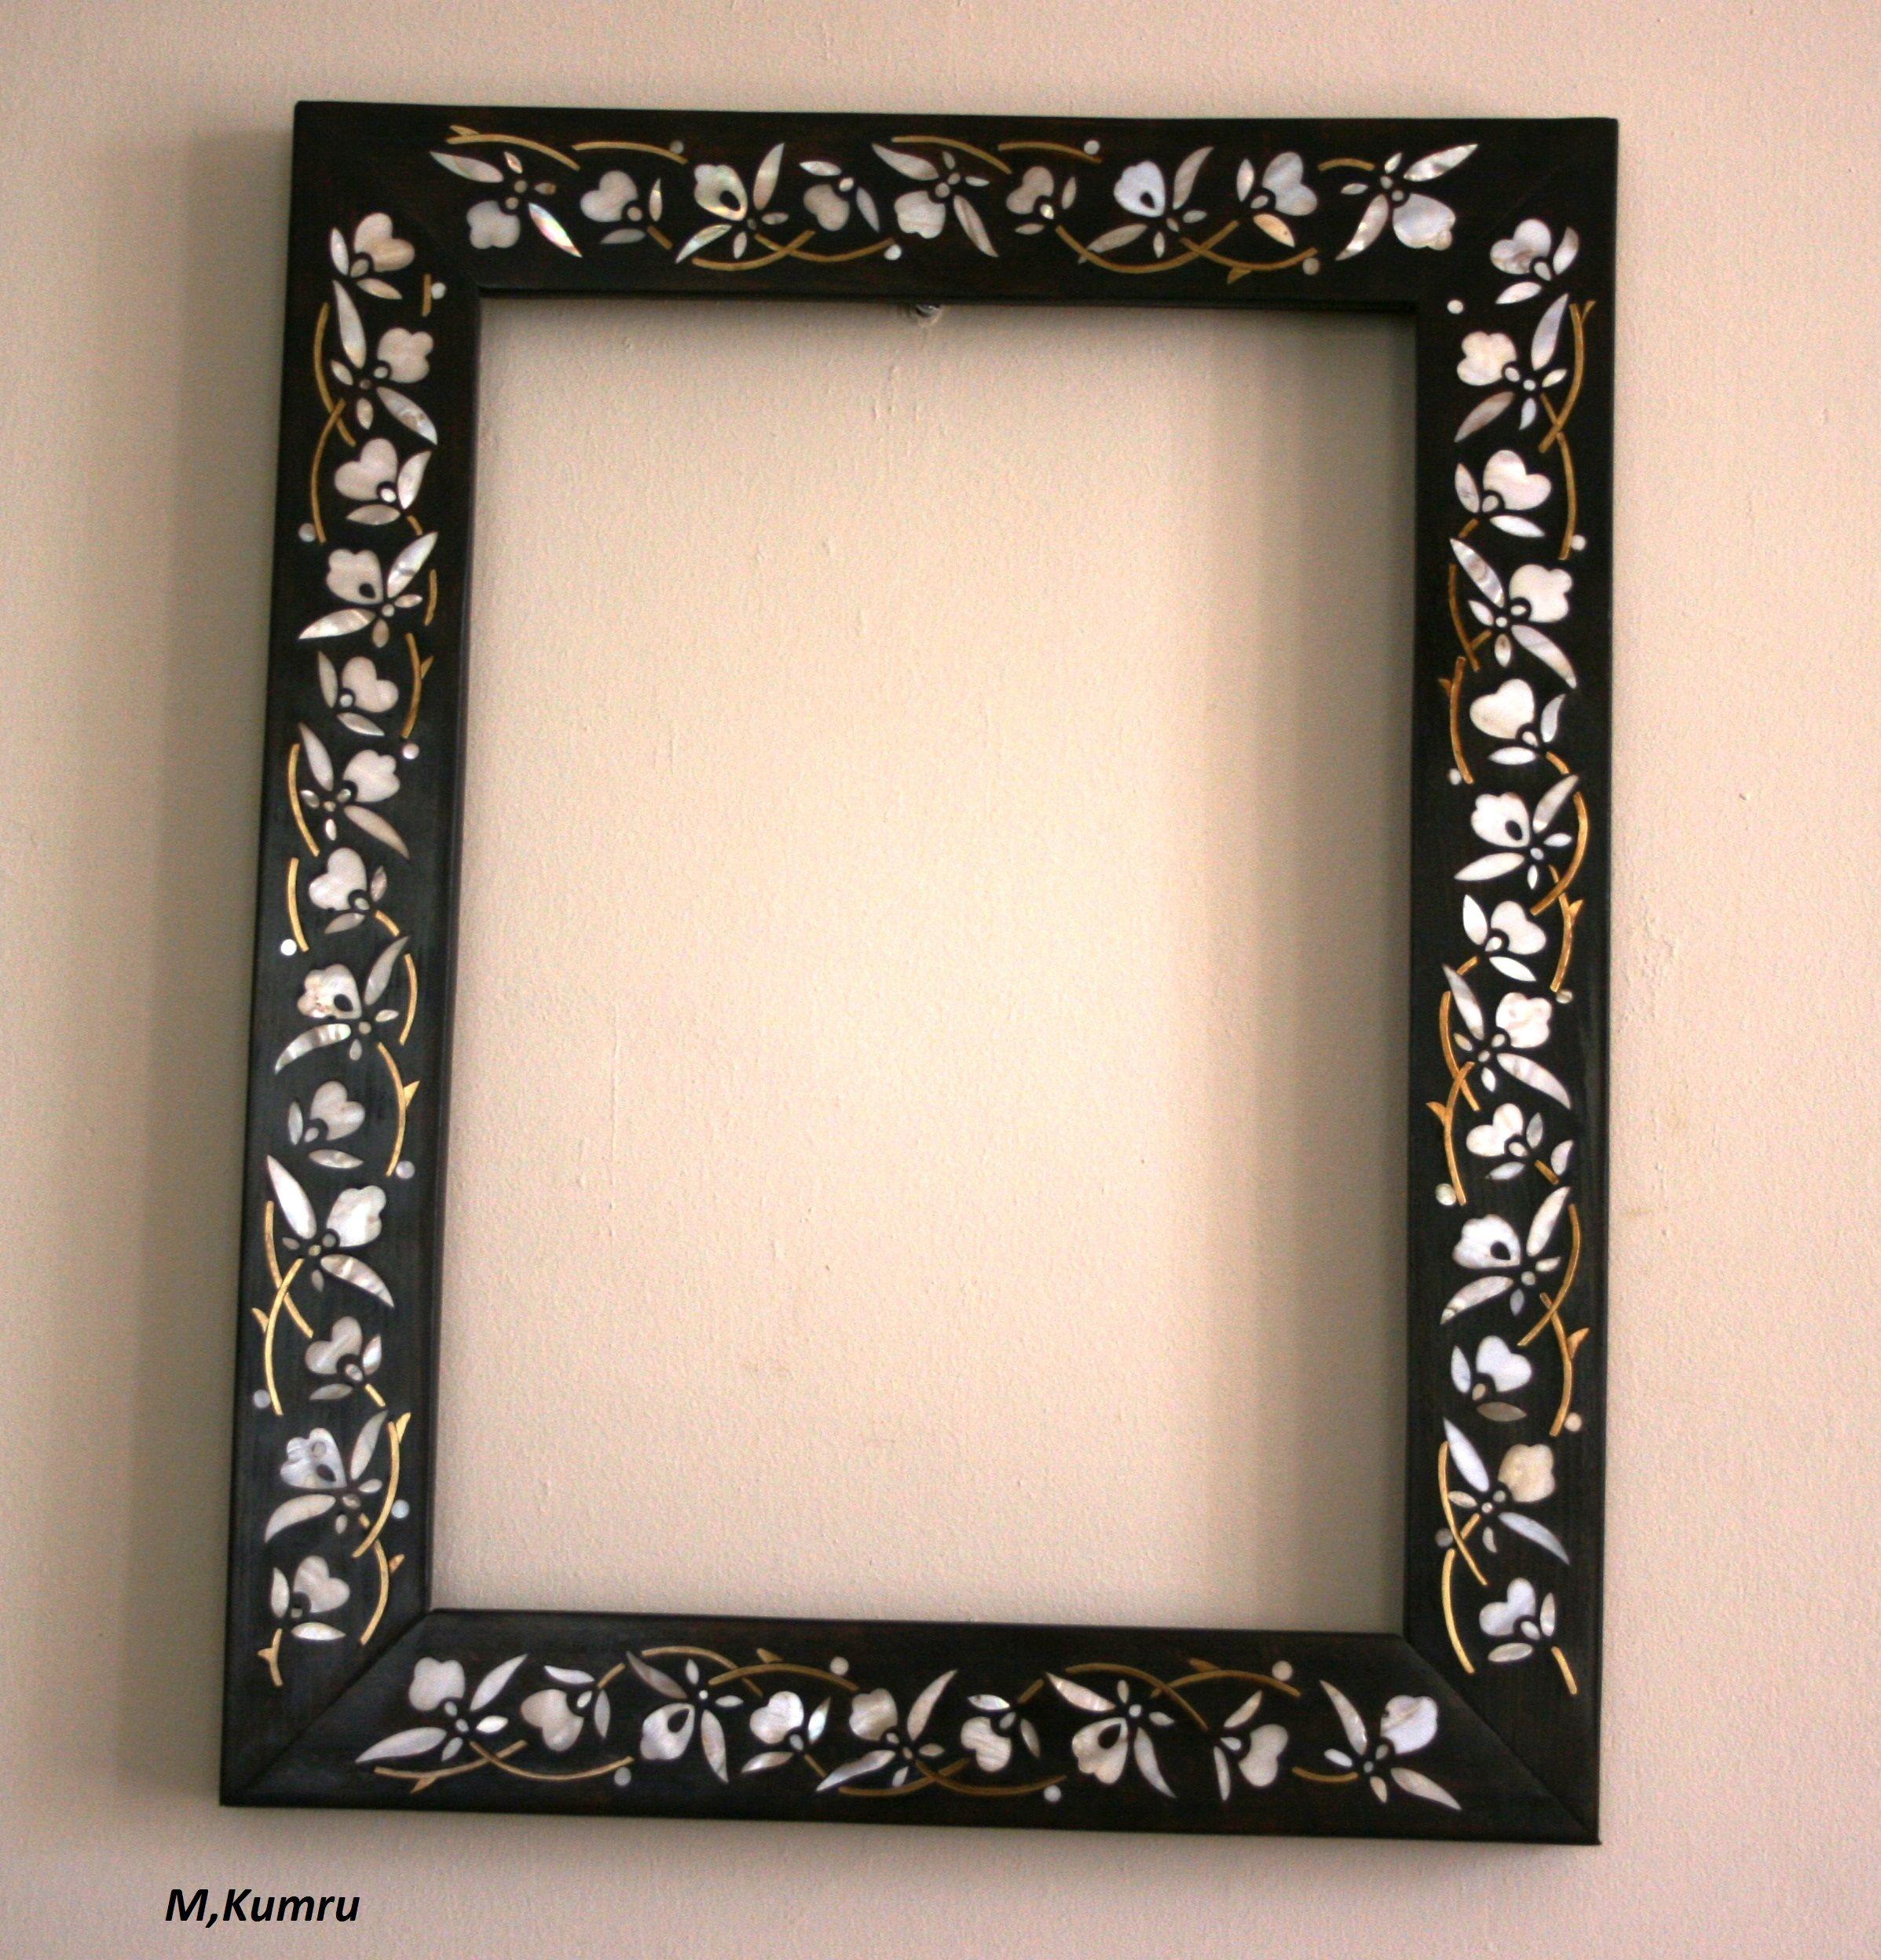 mother of pearl inlay mirror-sedef kakma ayna | Handmade | Pinterest ...